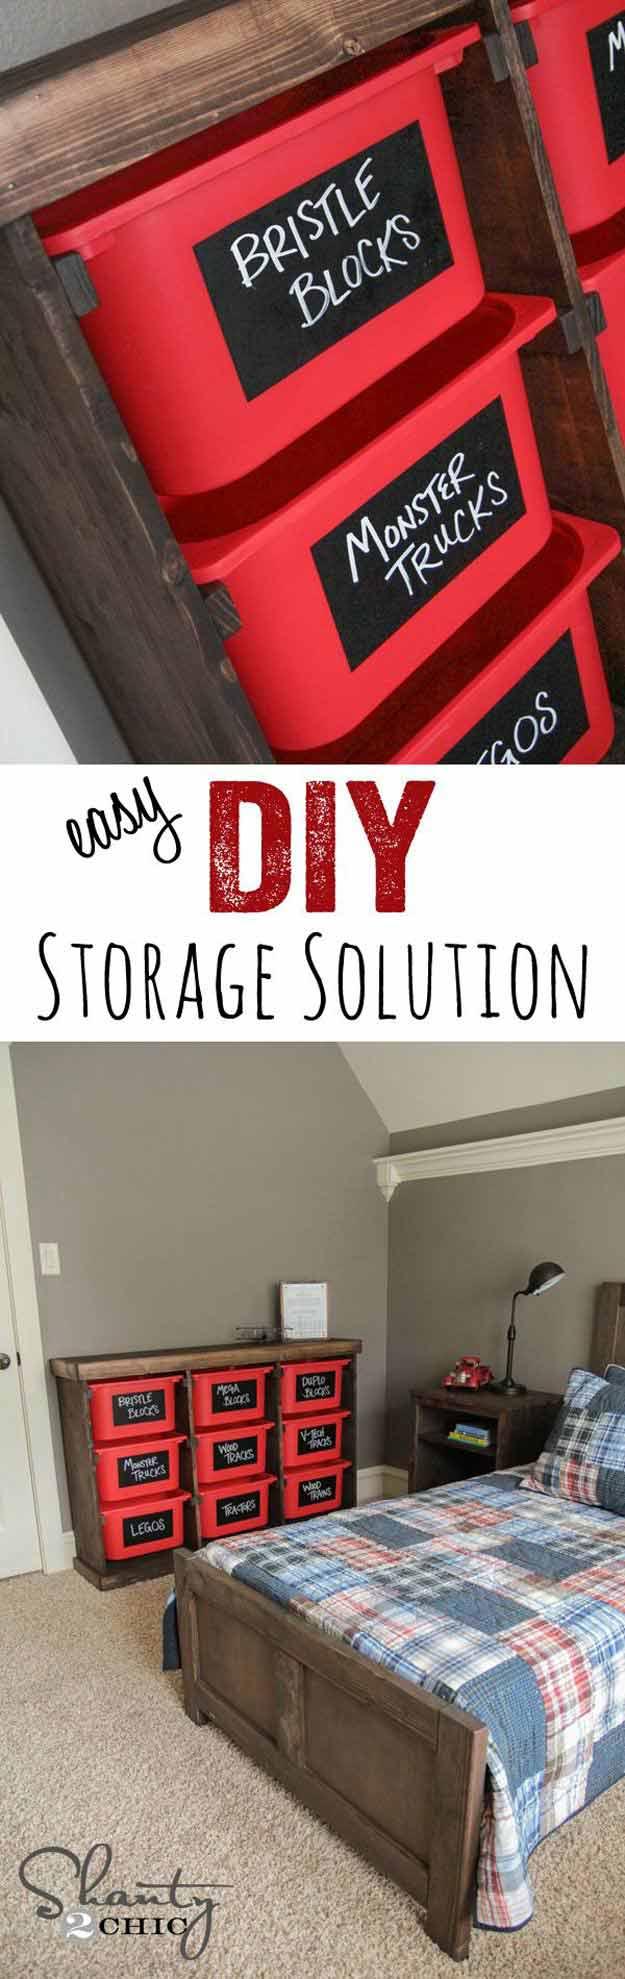 Easy DIY Toy Storage Idea   24 Smart DIY Toy & Crafts Storage Solutions